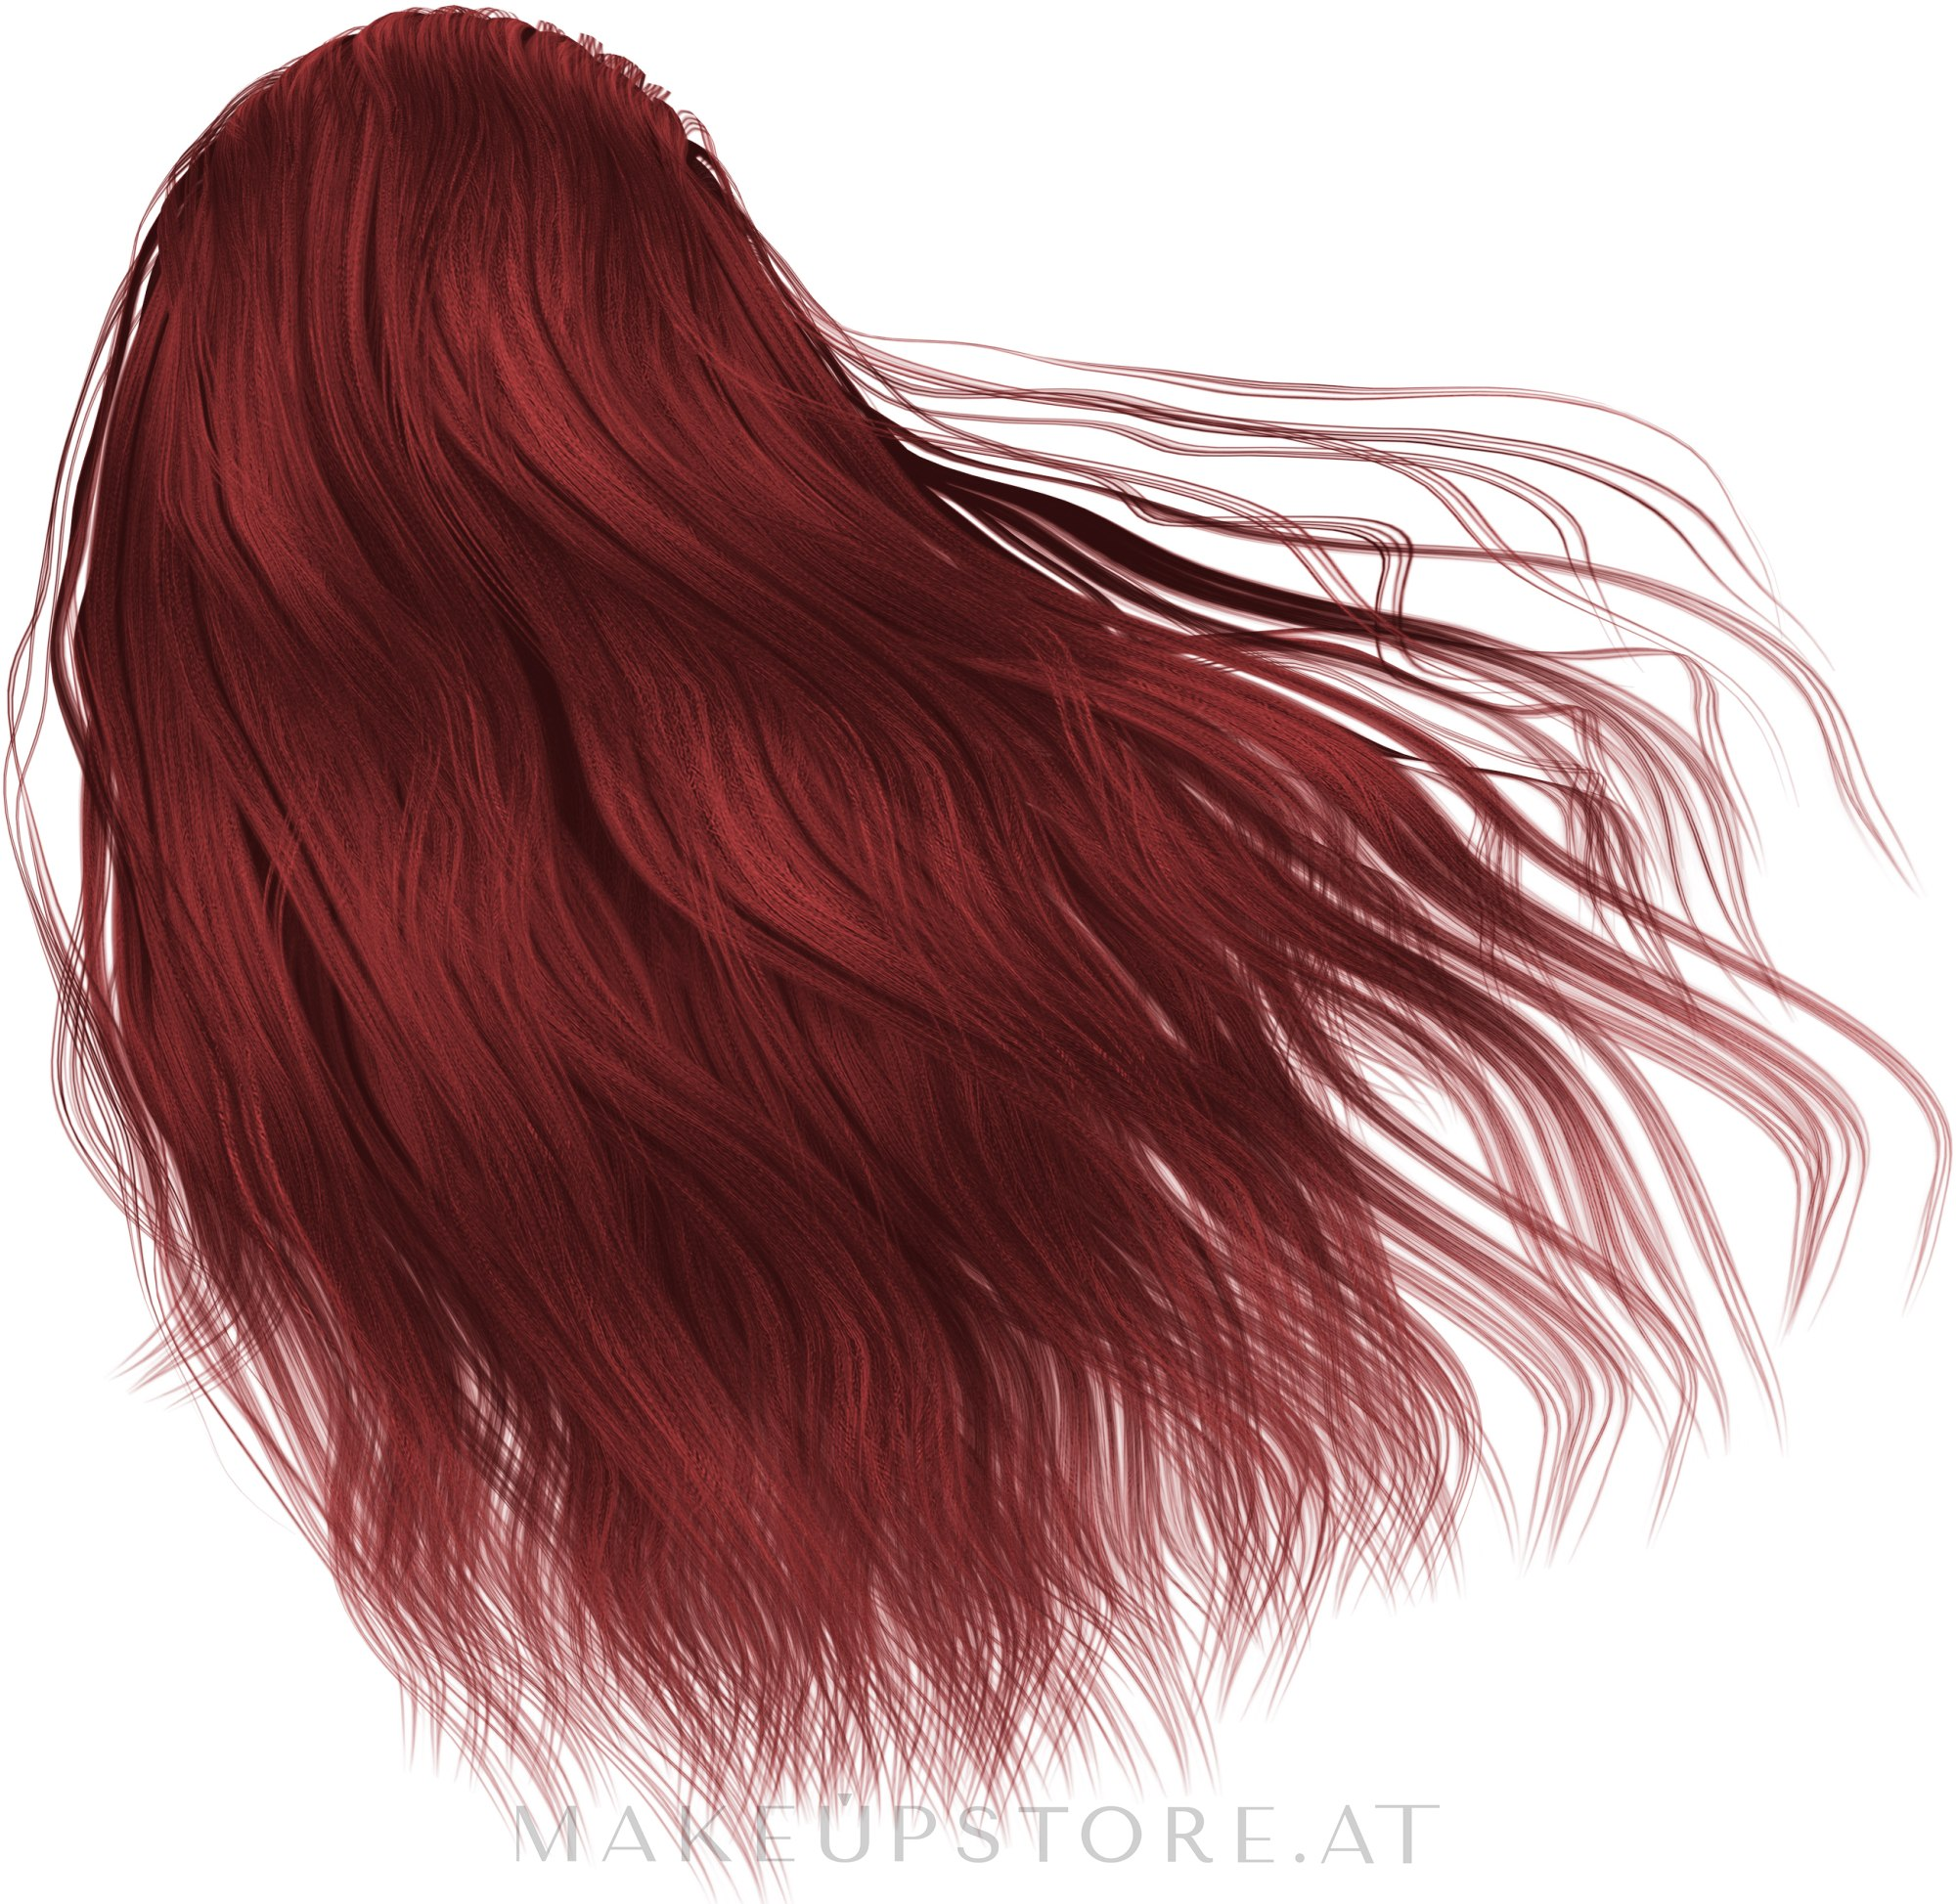 Permanente Cremehaarfarbe ohne Ammoniak - L'Oreal Professionnel Inoa Carmilane — Bild C6.66 - Dark Deep Red Blonde